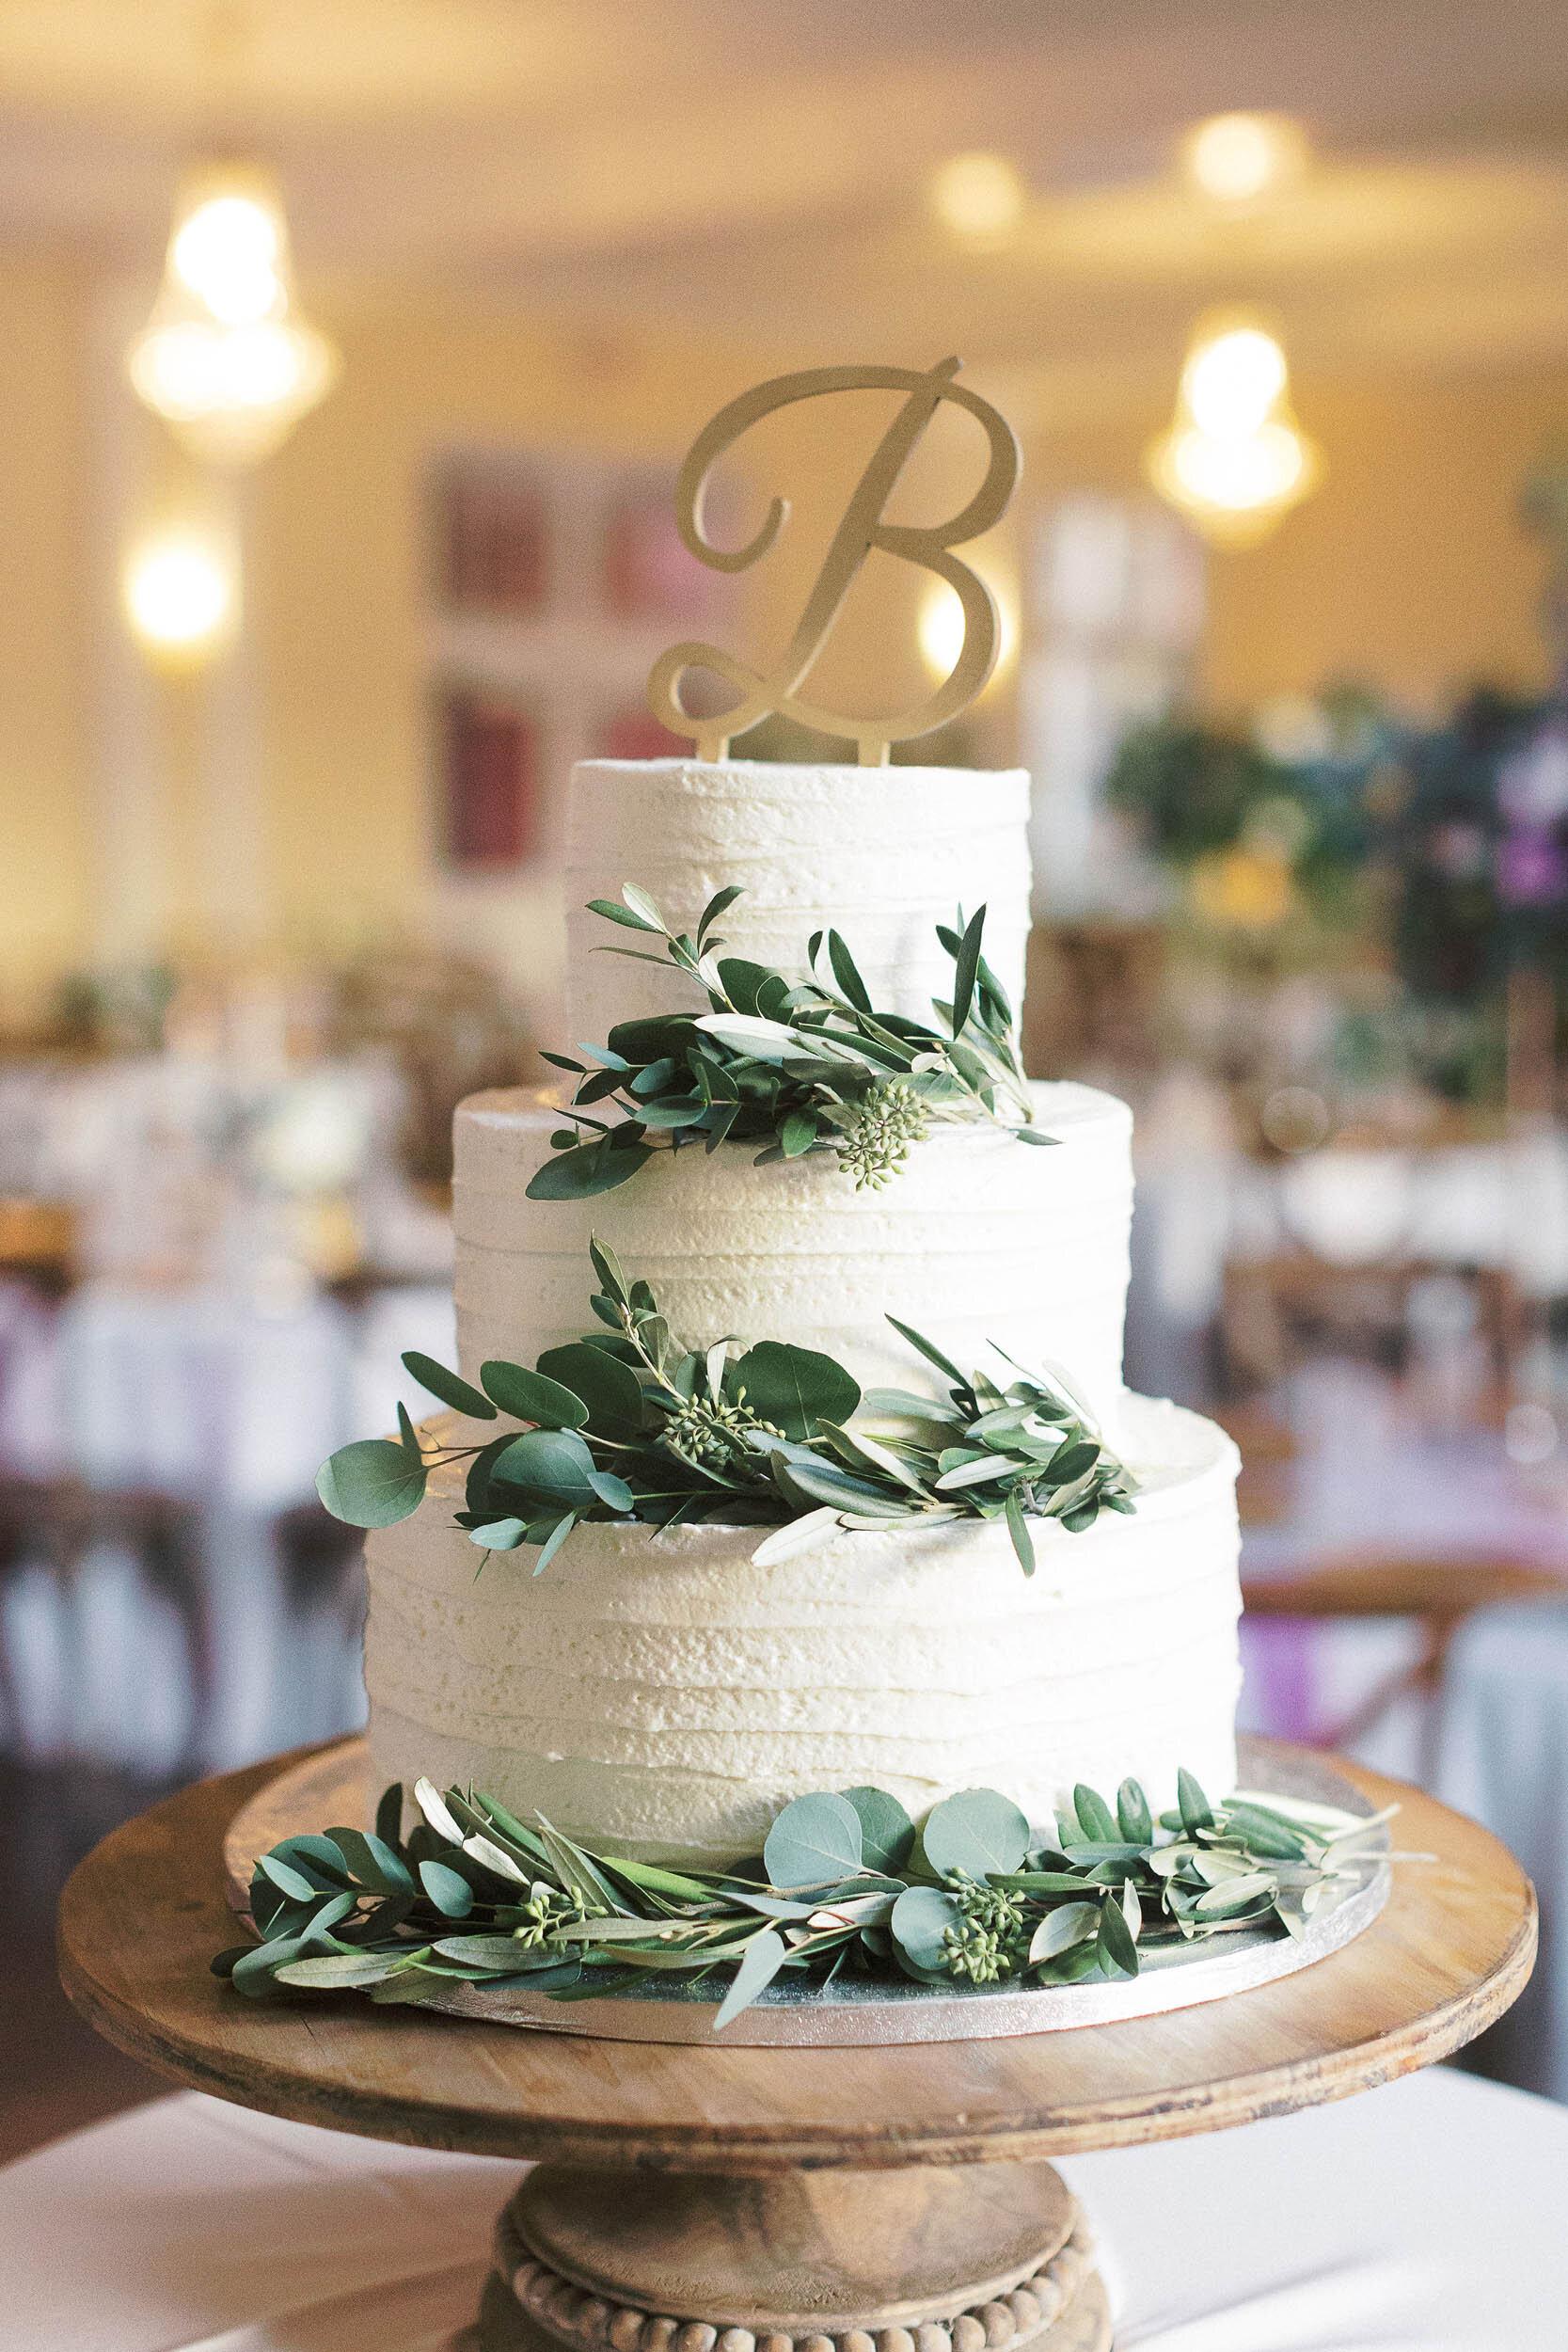 Cake Greenery